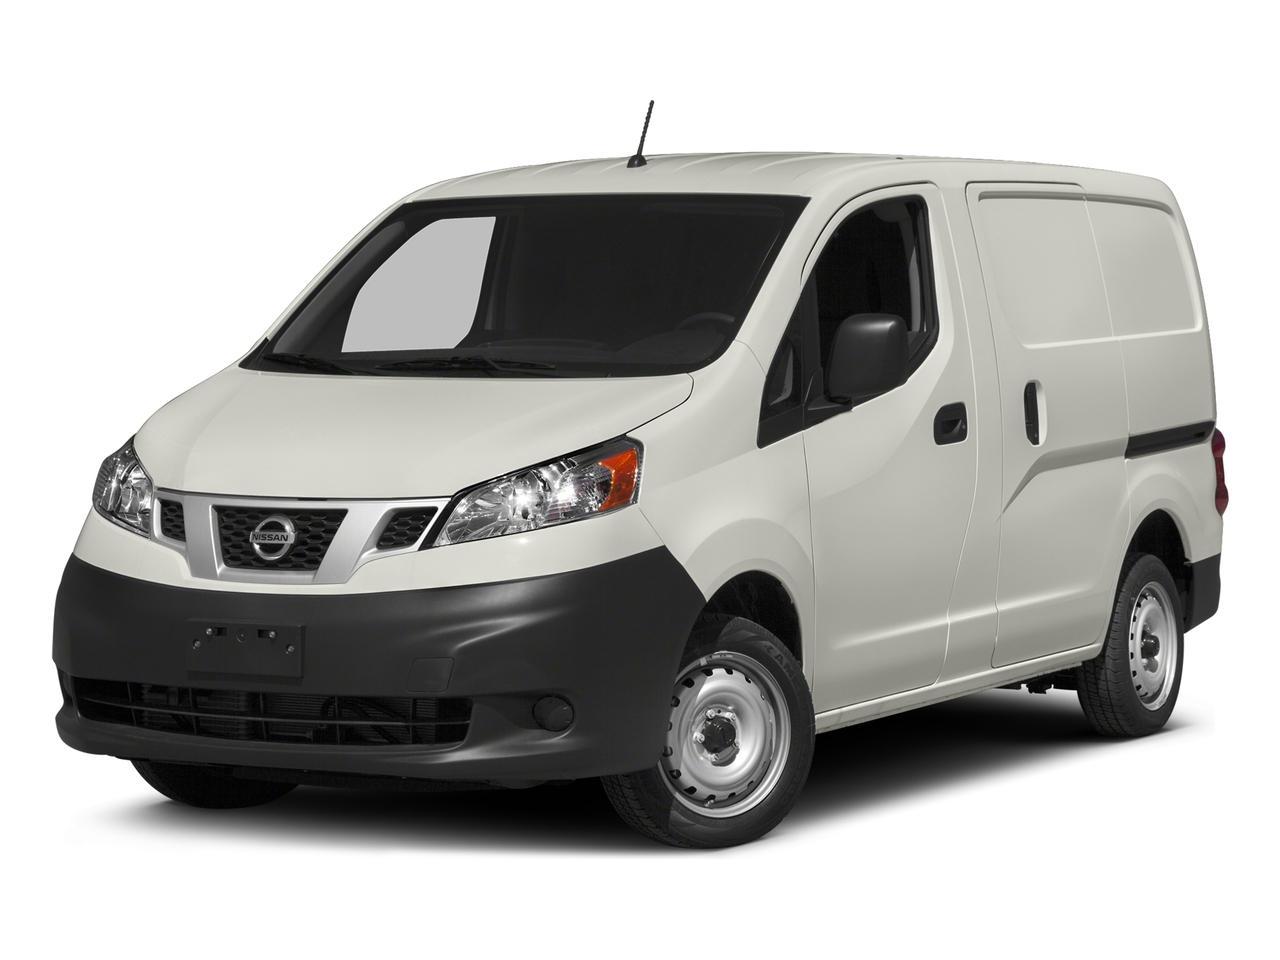 2017 Nissan NV200 Compact Cargo Vehicle Photo in Flemington, NJ 08822